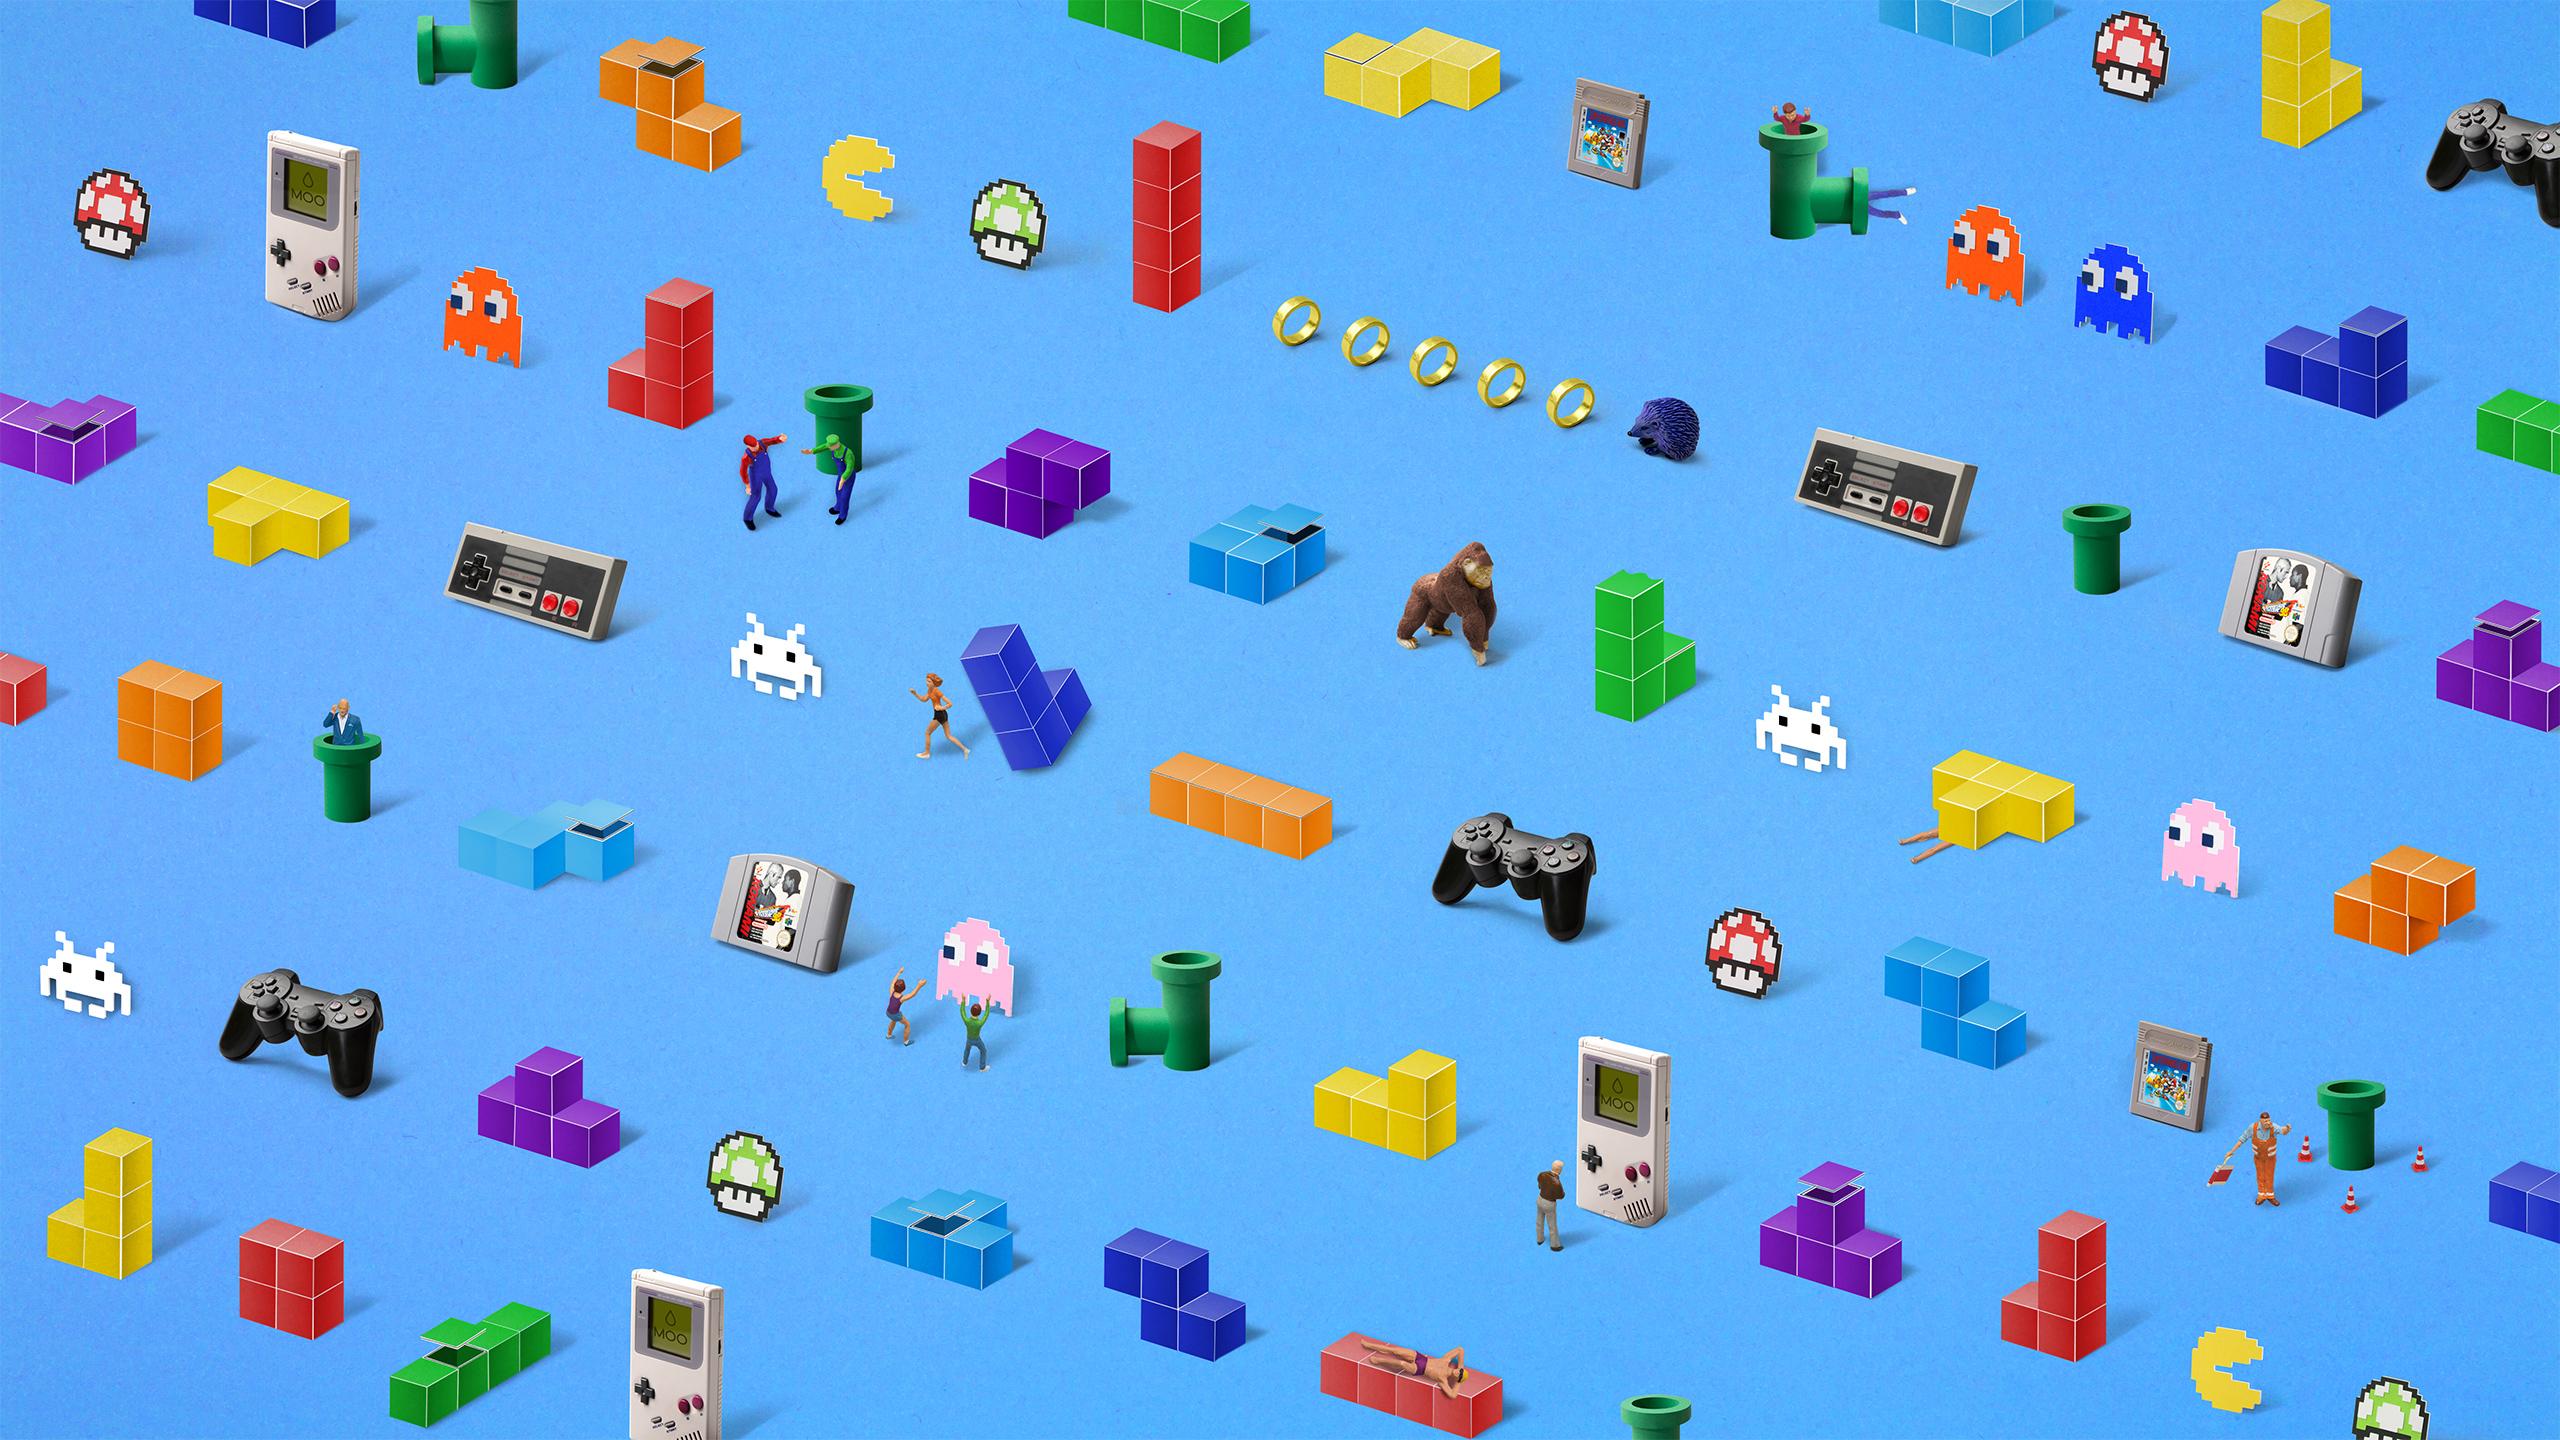 1440x900 wallpaper gaming